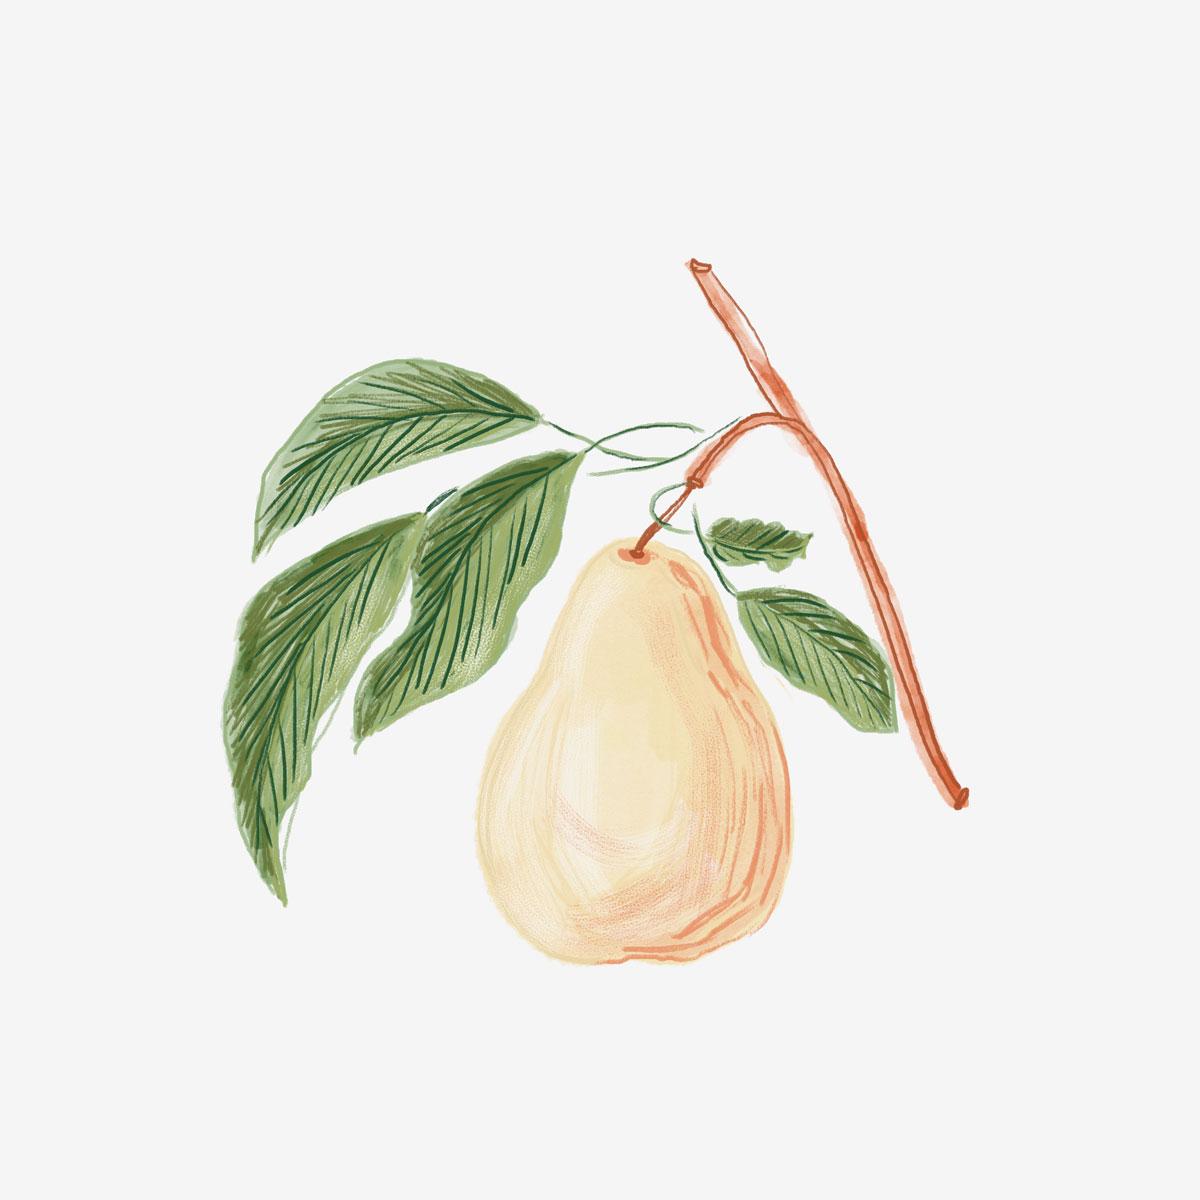 046-Pear.jpg